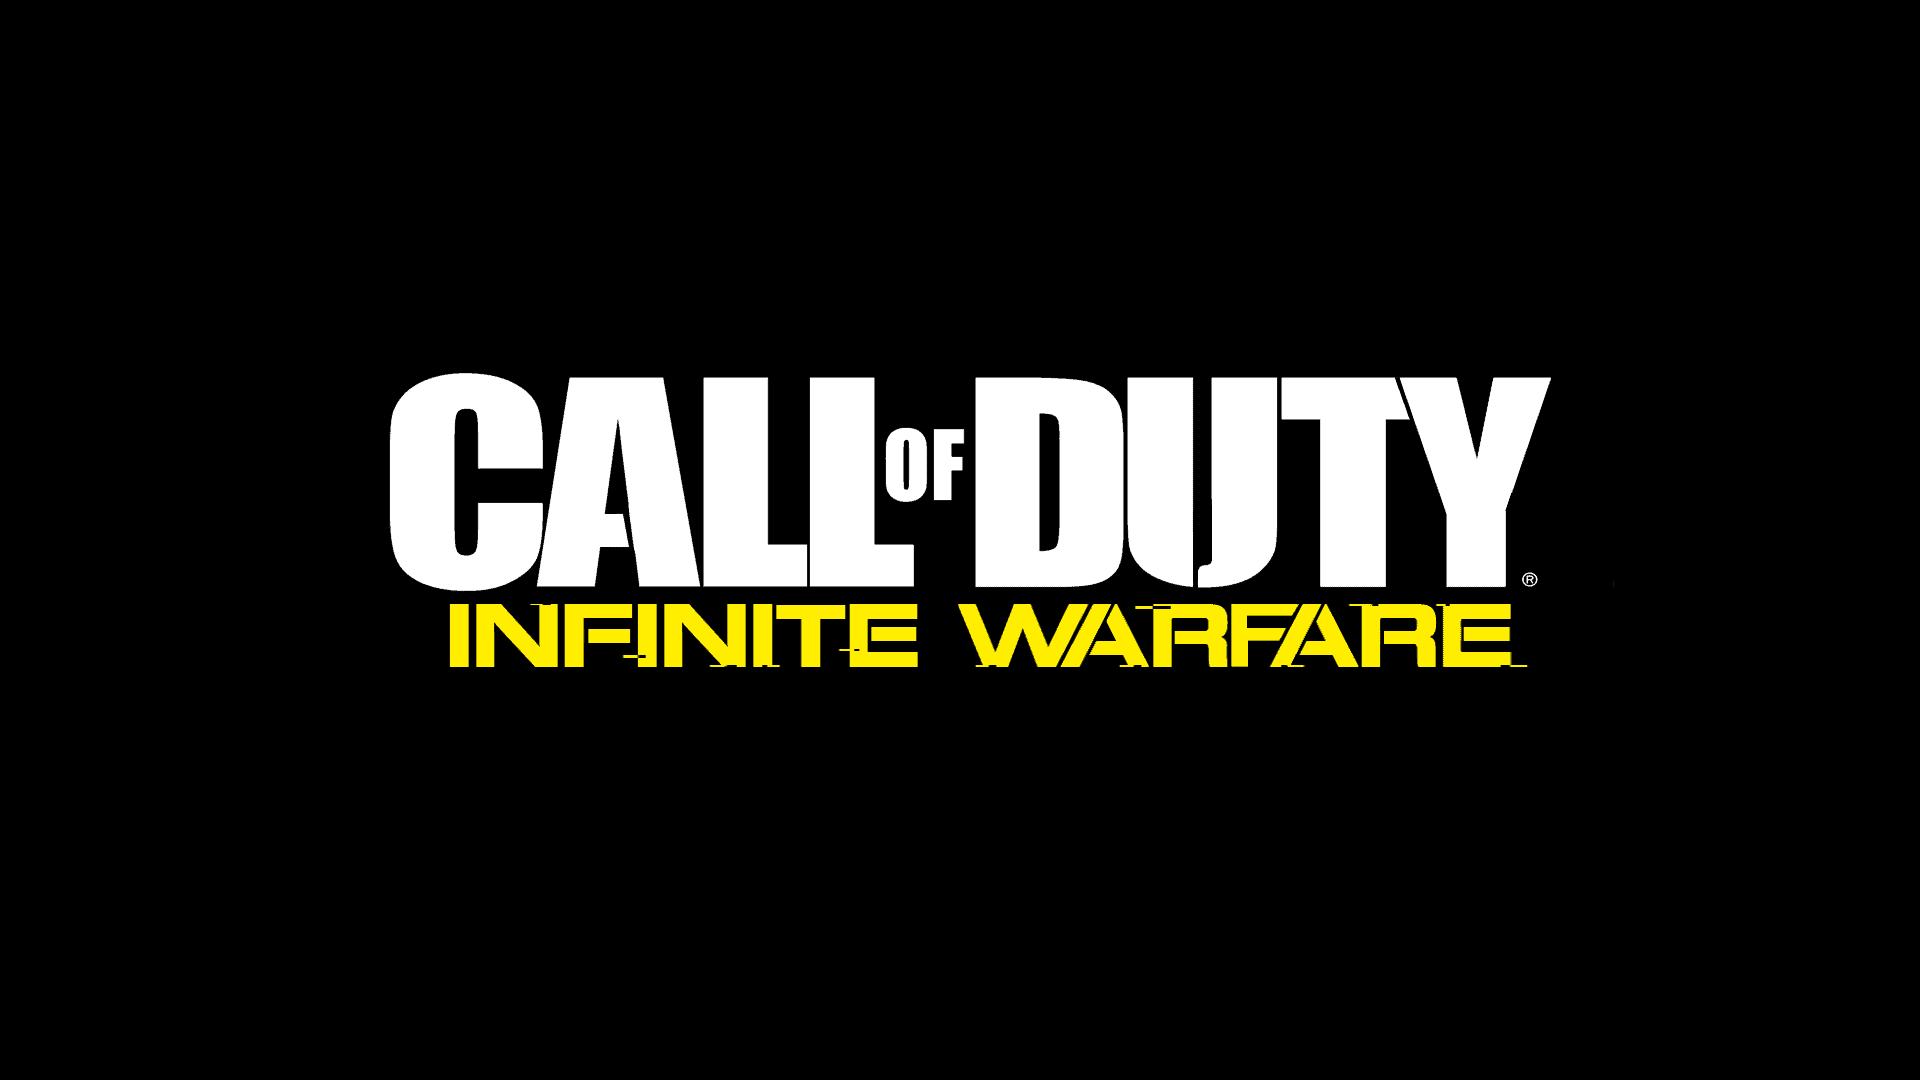 call-of-duty-infinite-warfare-logo-wallpaper